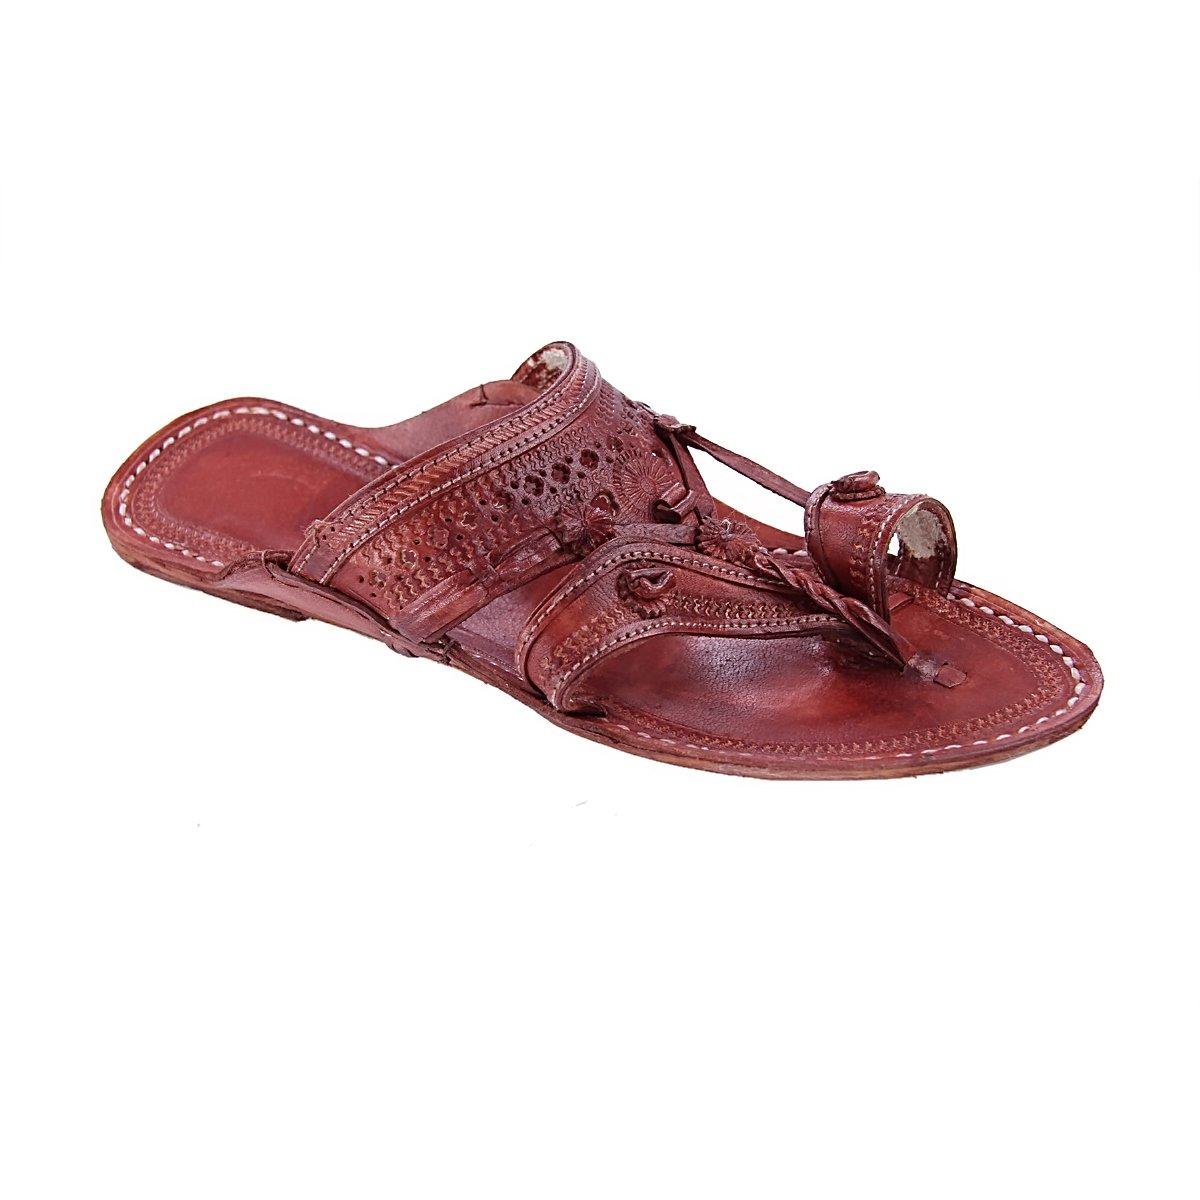 original kolhapuri chappal Traditional red eye-catching red Traditional brown for men slipper sandal B078BS6R6B Sandals 672cfb